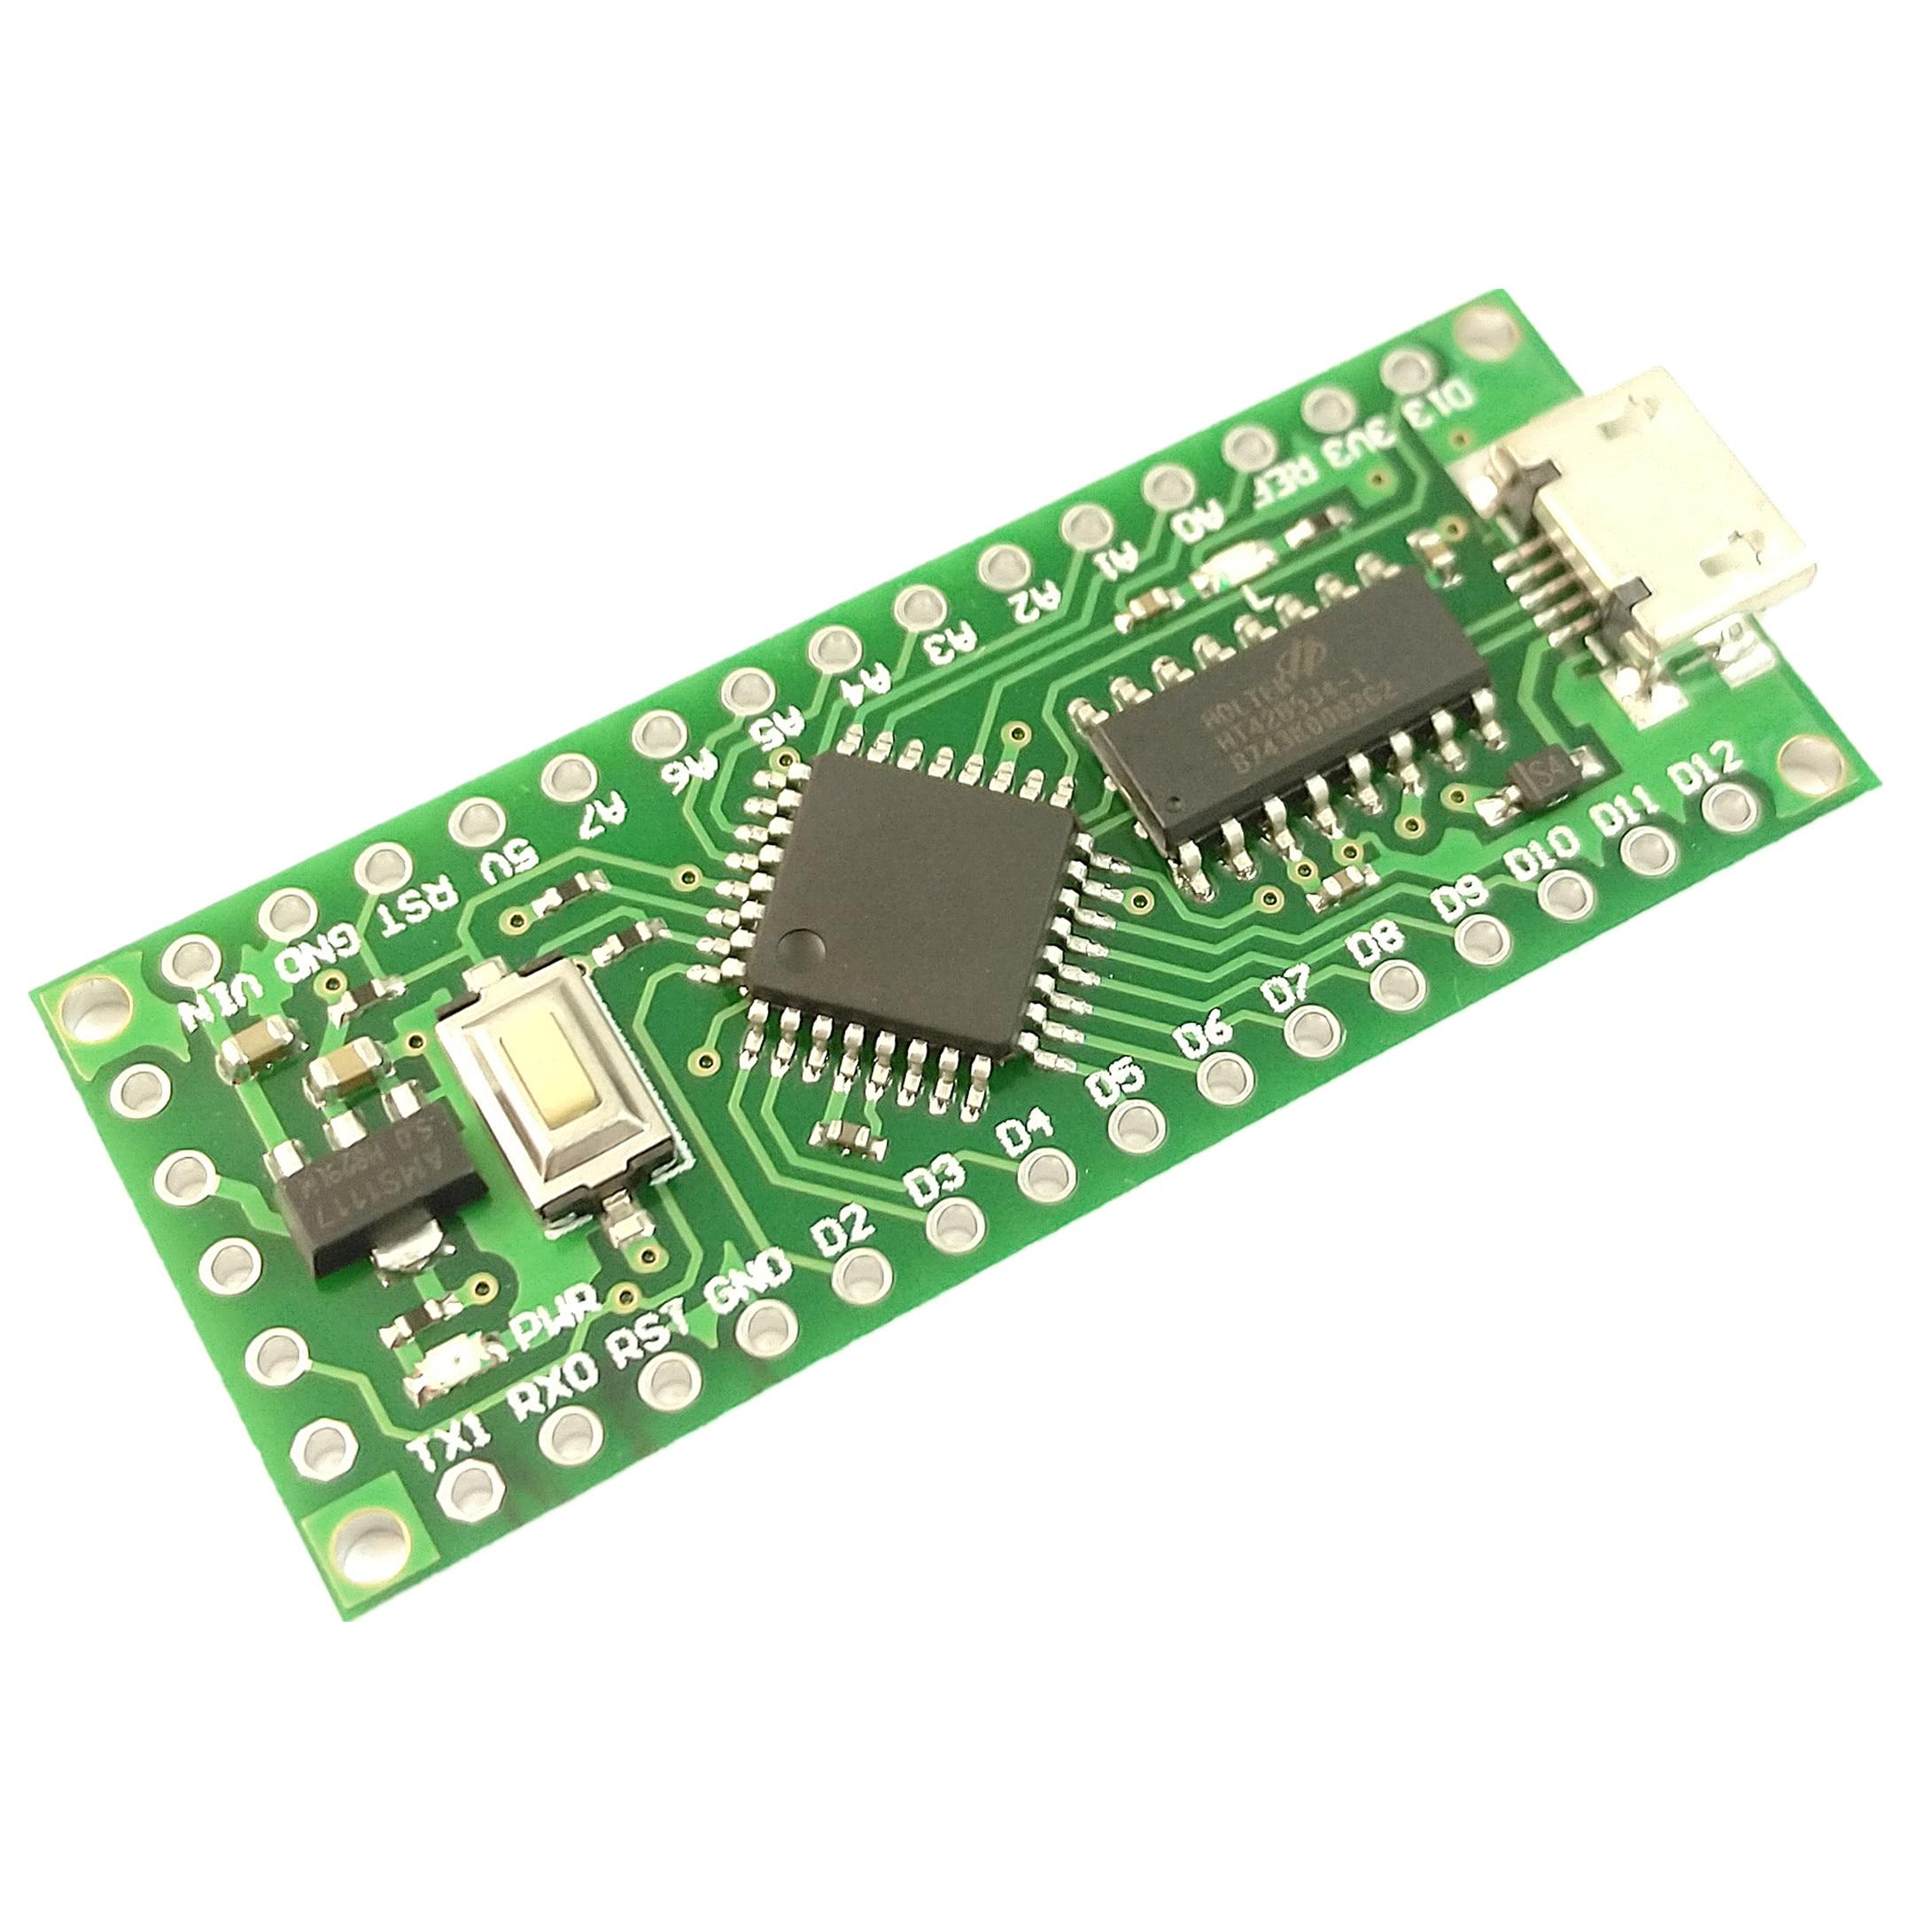 1pcs-lgt8f328p-lqfp32-minievb-alternative-font-b-arduino-b-font-nano-v30-atmeag328p-ht42b534-1-sop16-usb-driver